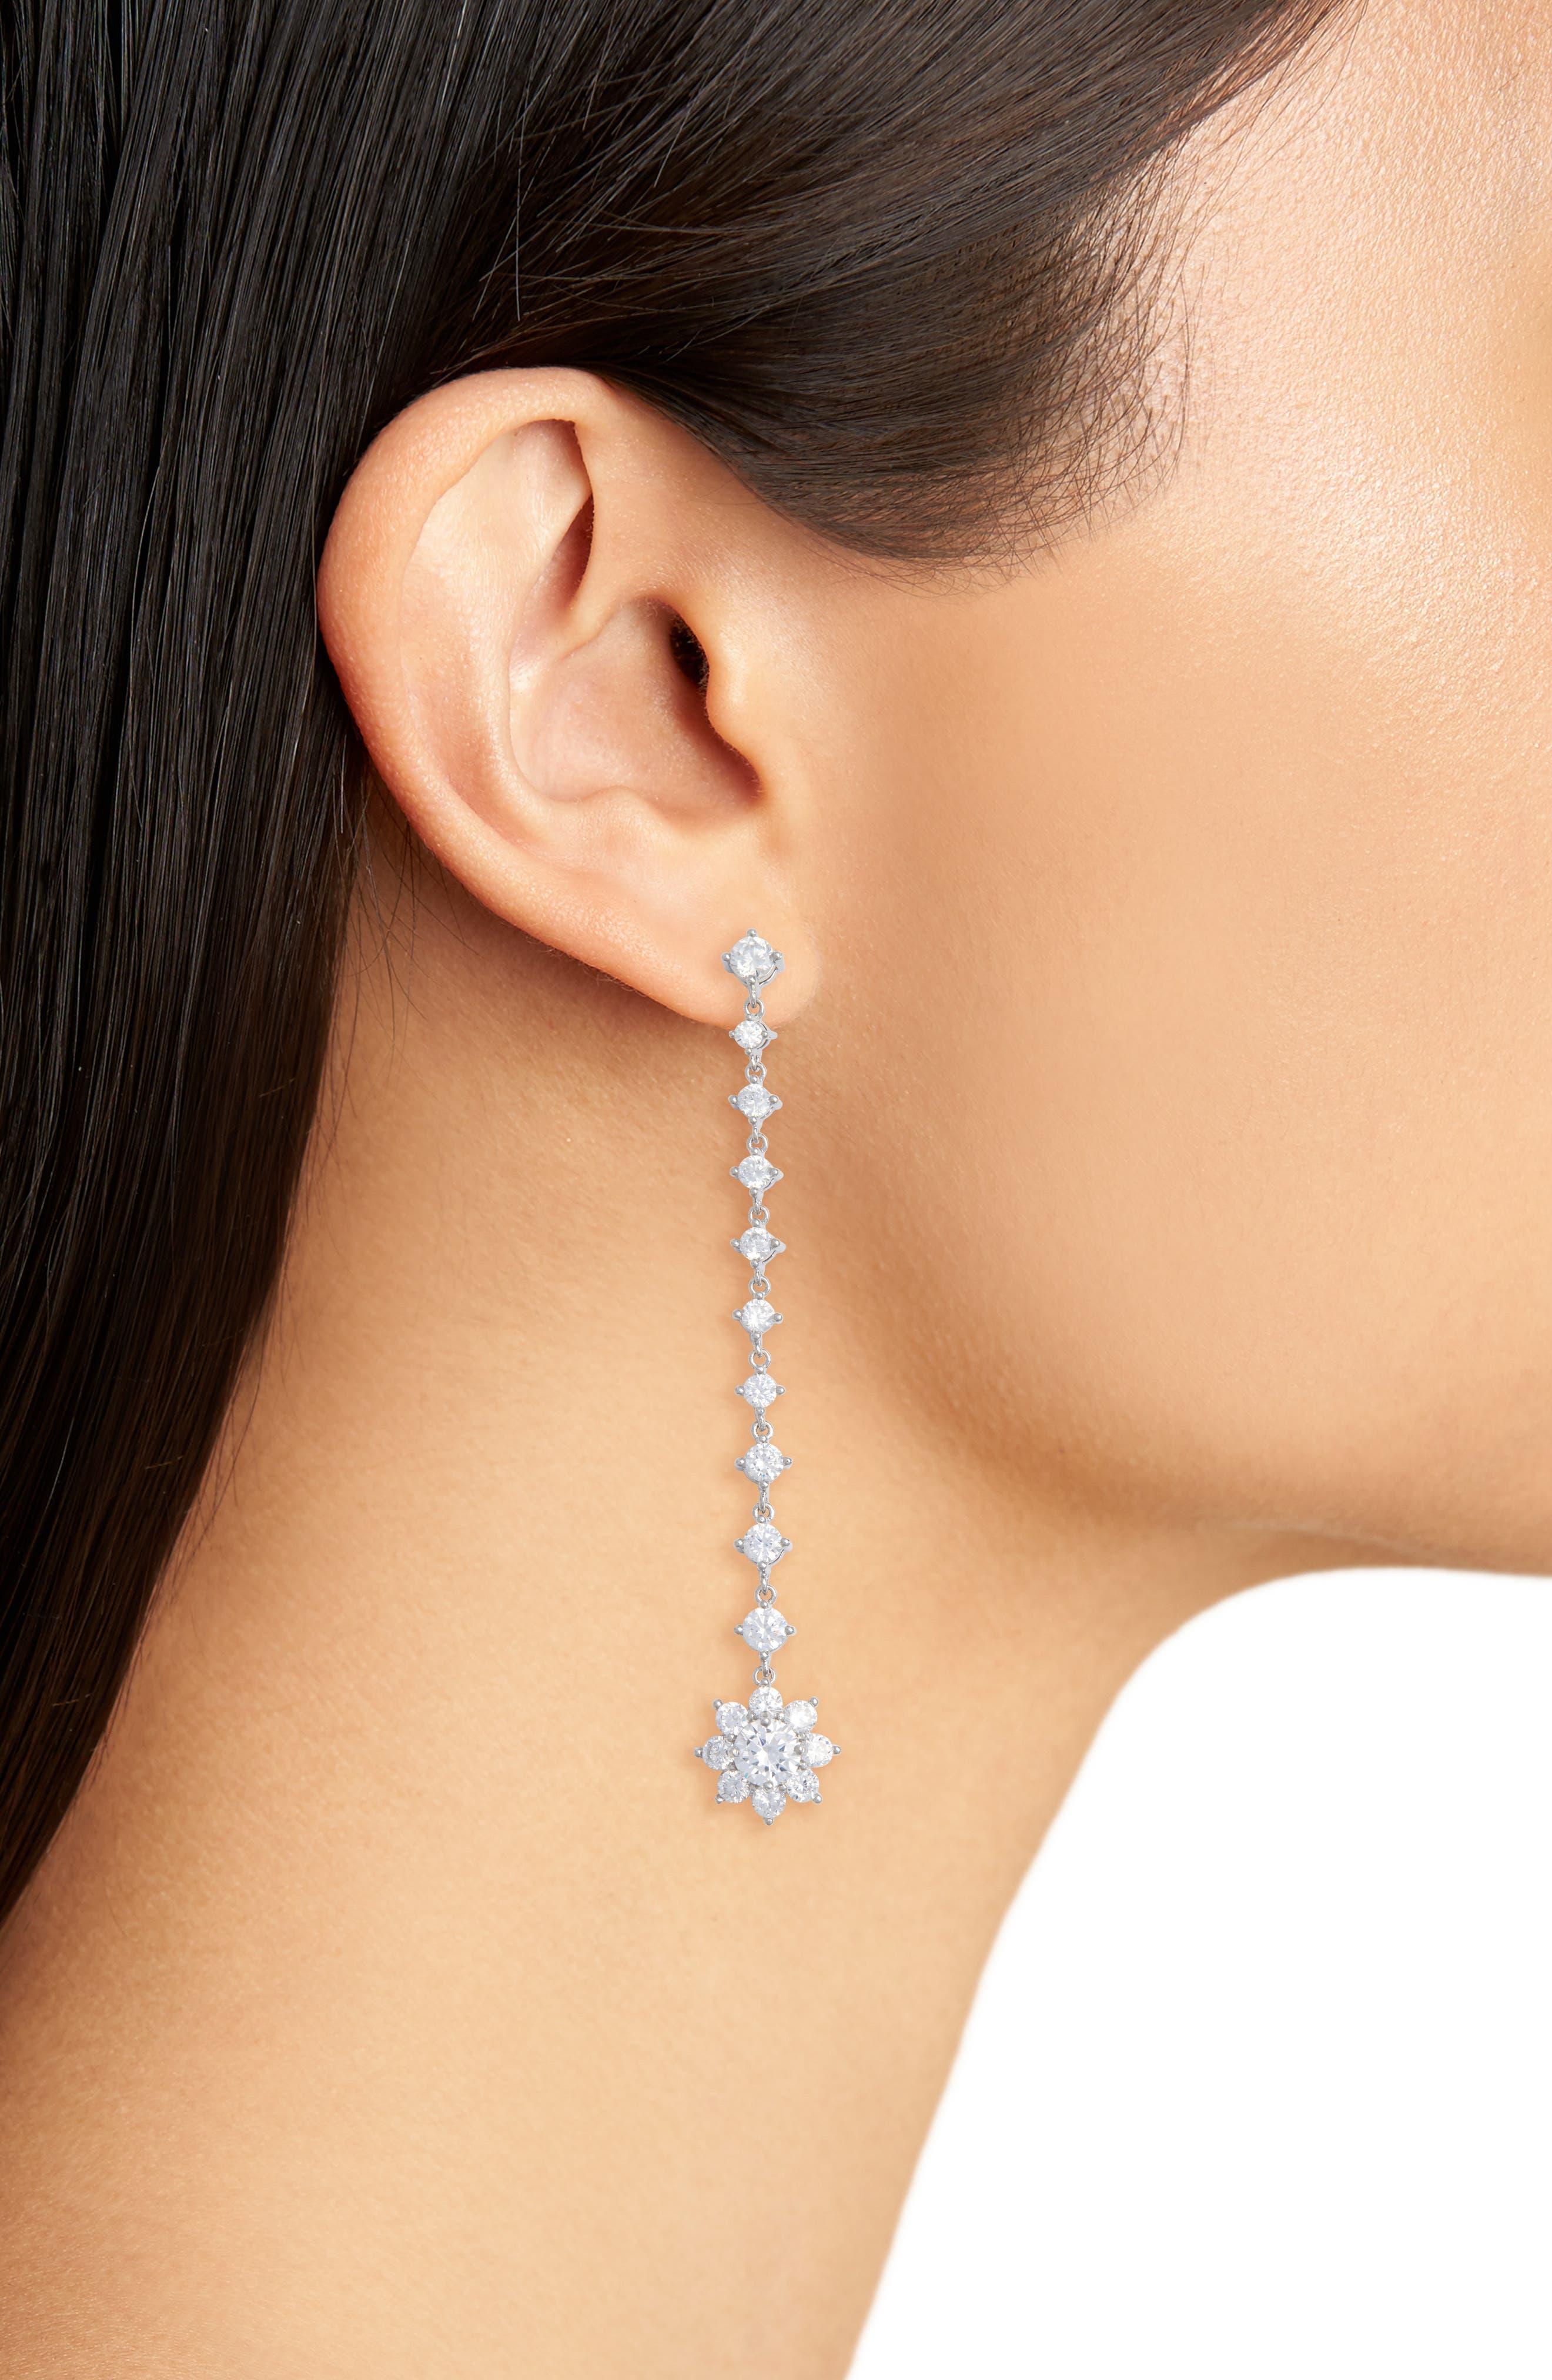 Small Flower Linear Drop Earrings,                             Alternate thumbnail 2, color,                             SILVER/ WHITE CZ